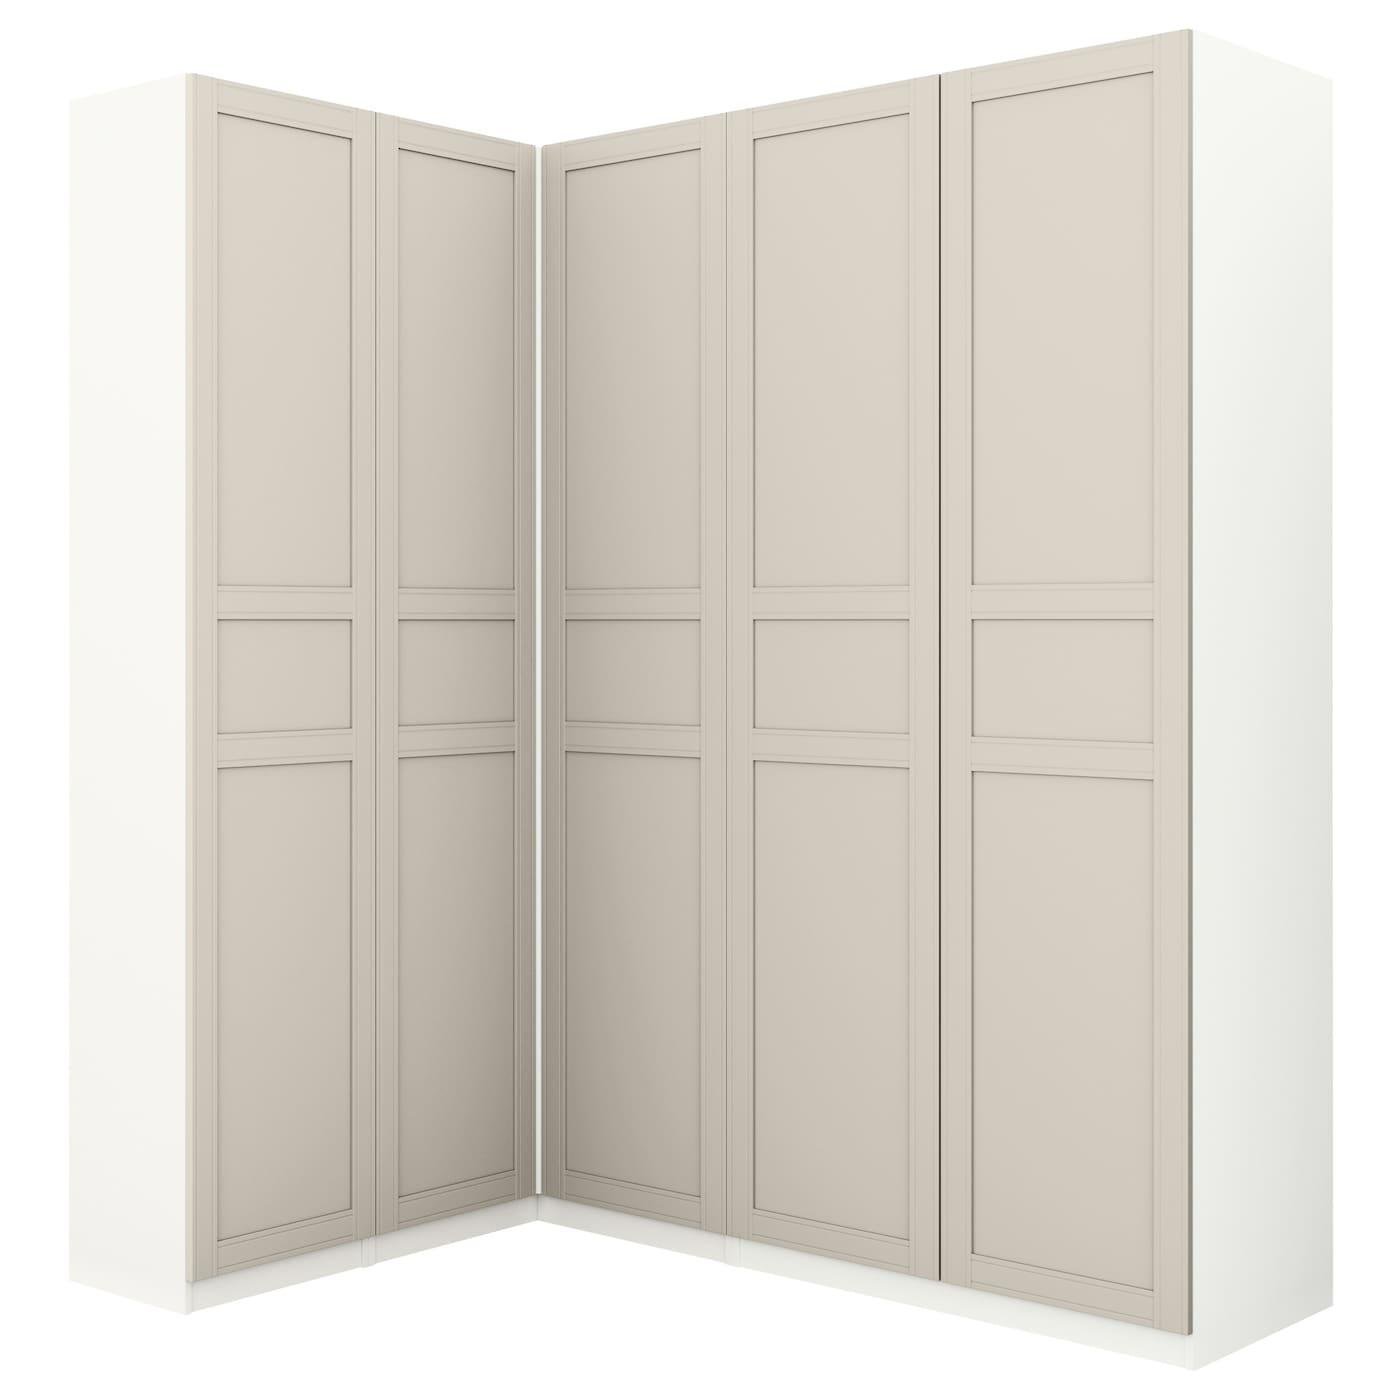 Sewing Ceramic Knobs Pull Door Closet Handle Kitchen 1889 Wardrobe Cabinet